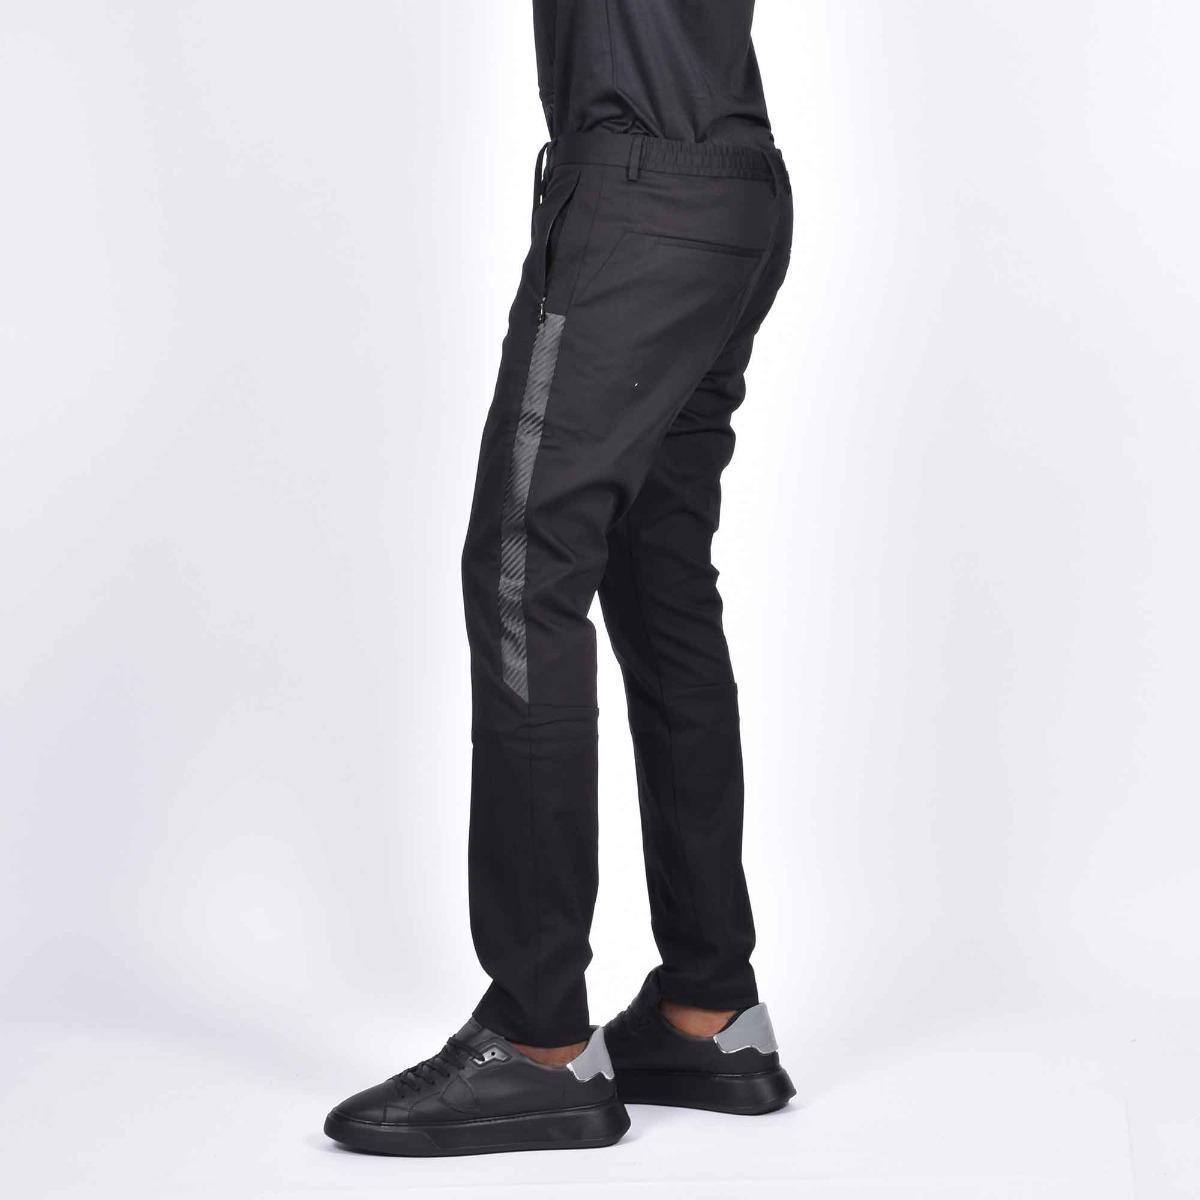 Pantalone inserto fibra carbonio - Nero